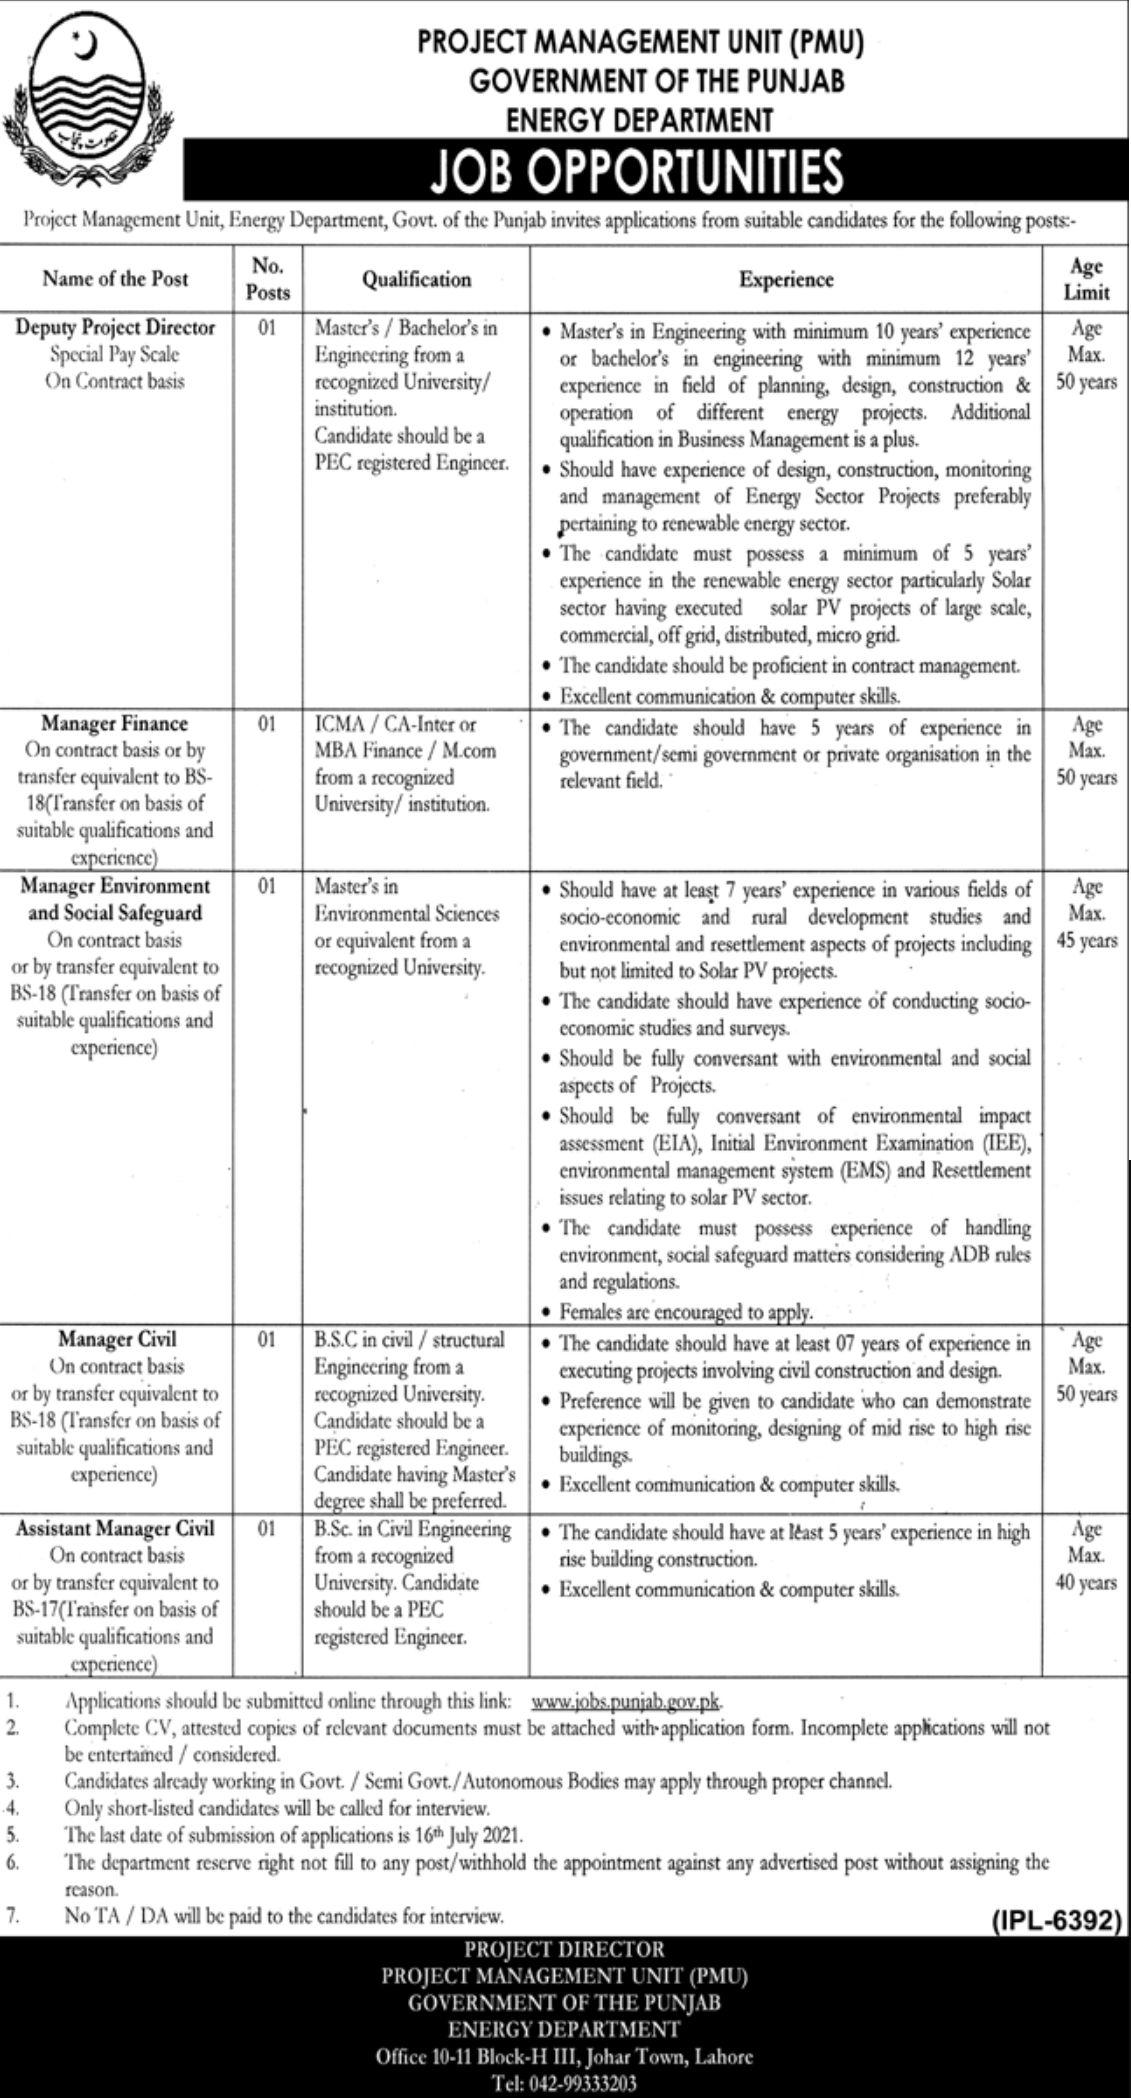 Project Management Unit PMU Vacancies 2021 3